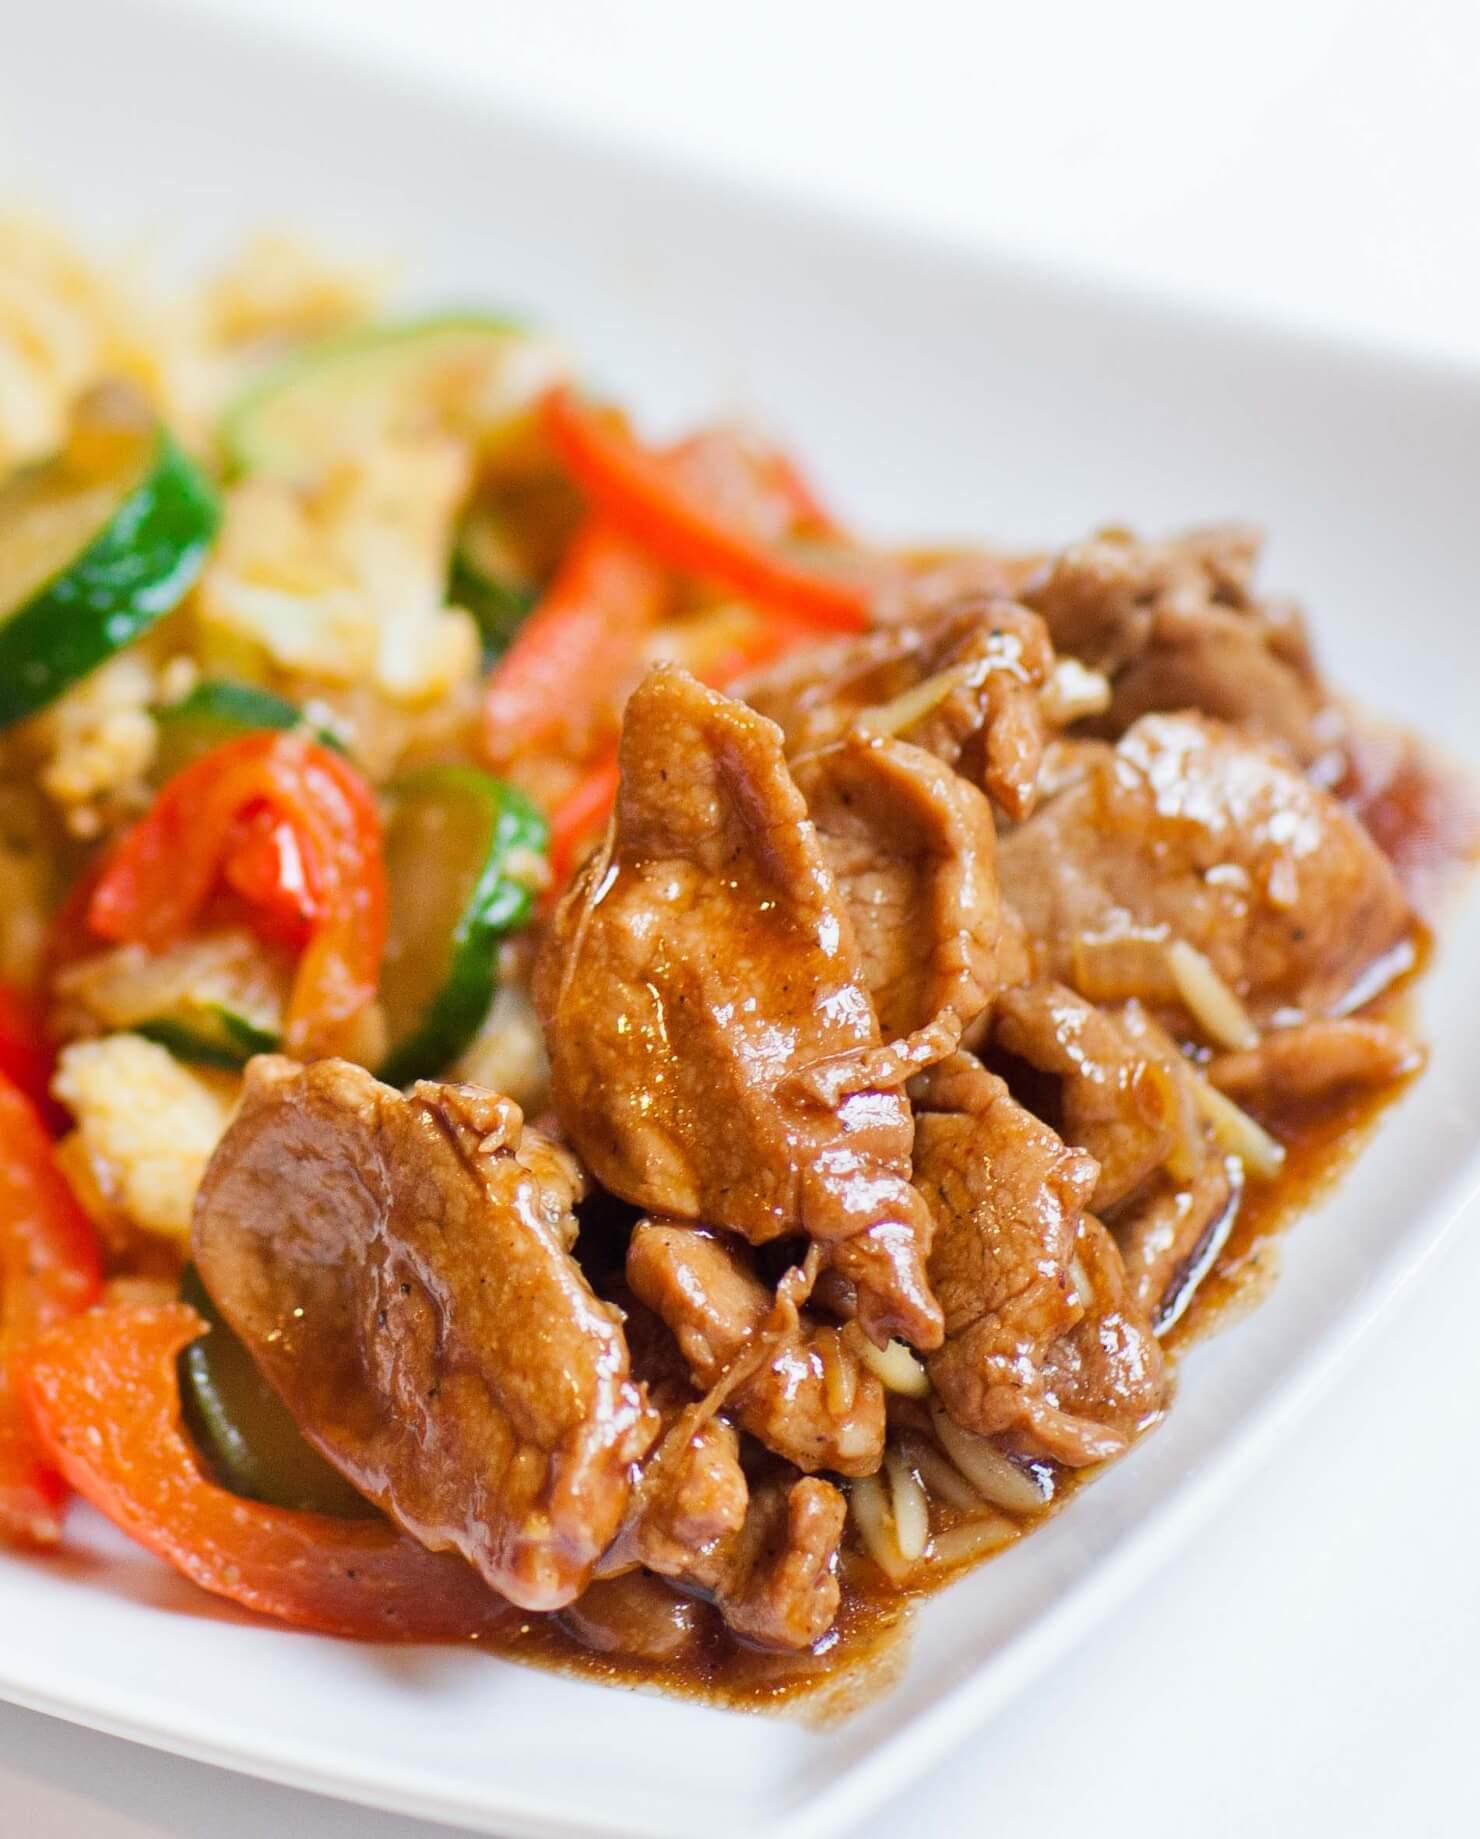 Teriyaki Pork Stir-Fry With Seasoned Orzo